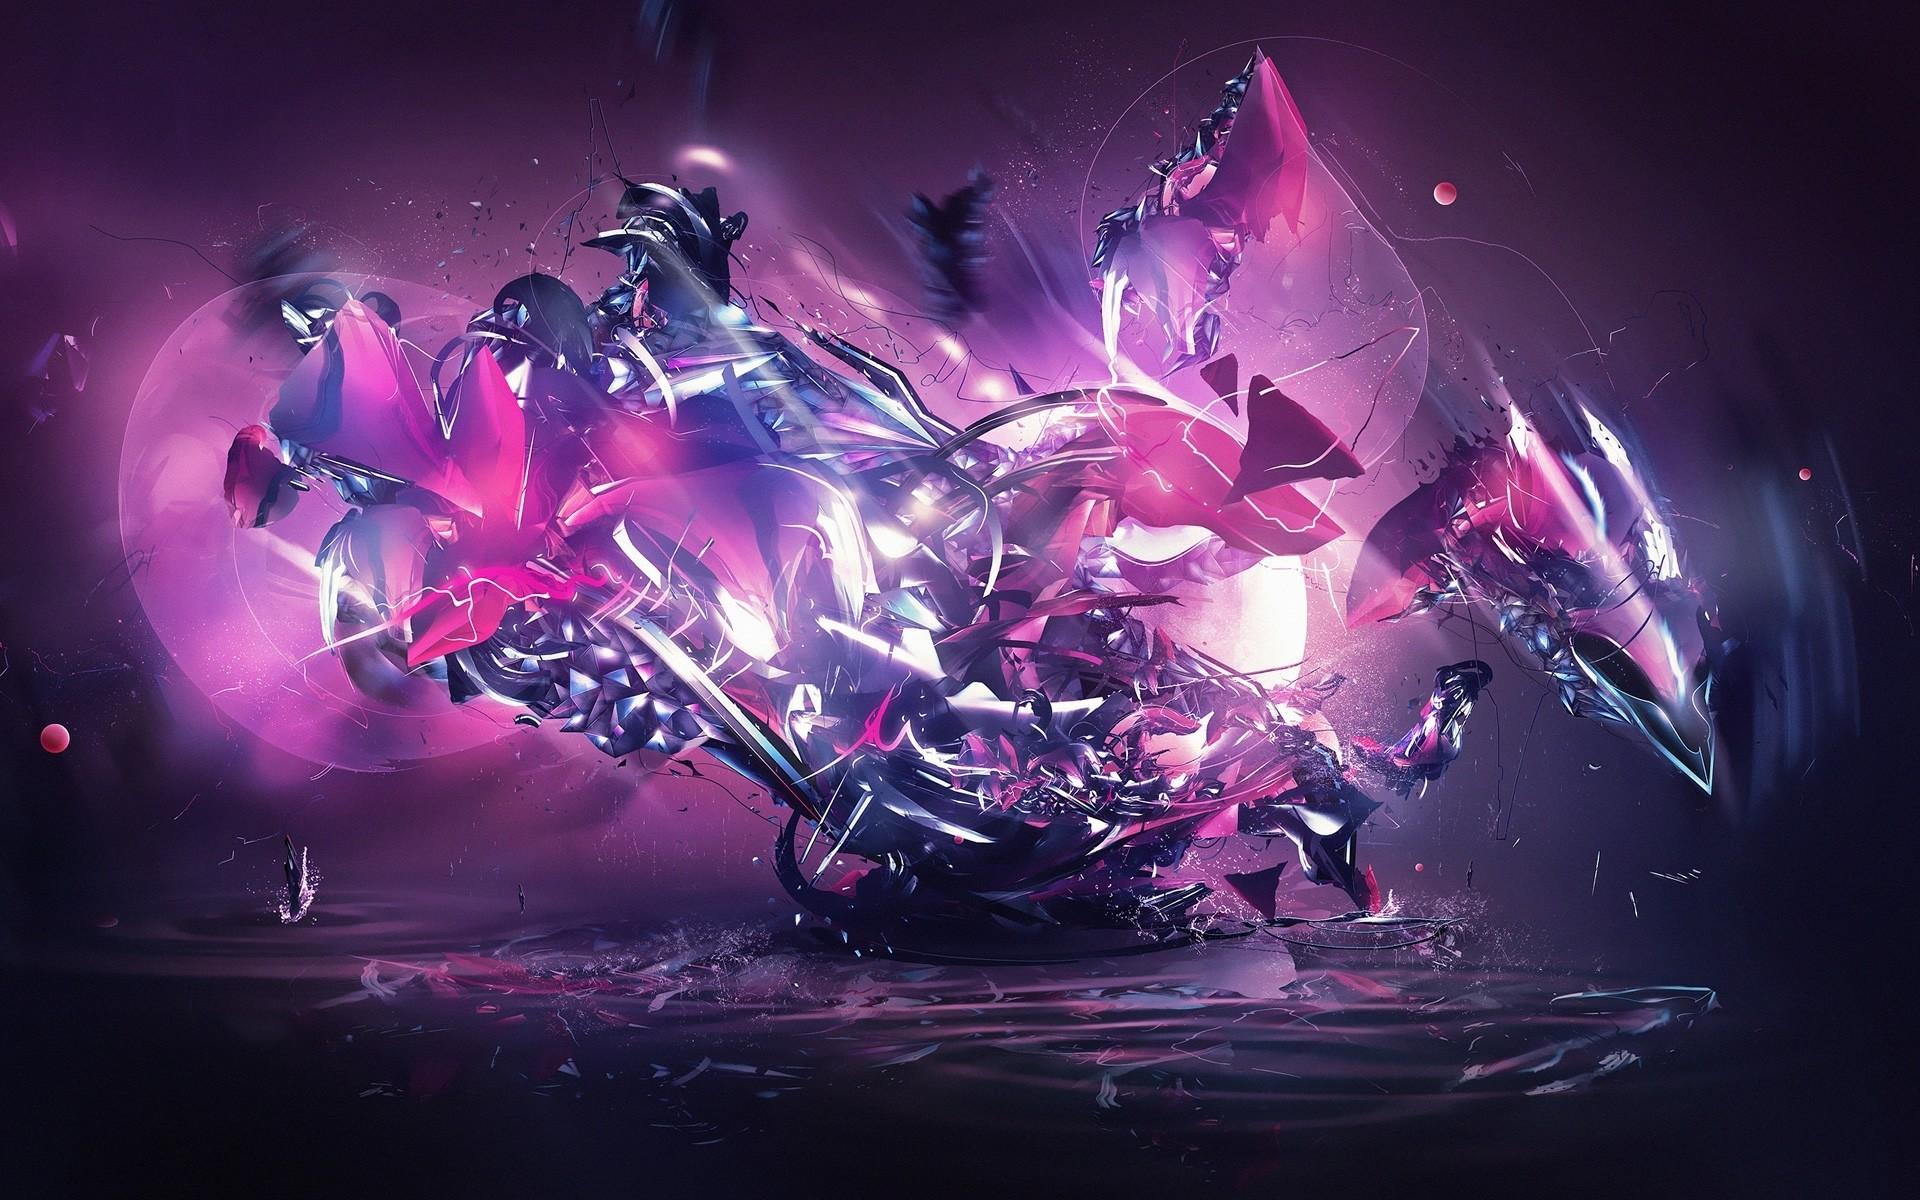 Purple wallpaper | purple ~~ passionate about purple | Pinterest | Purple  wallpaper, Purple and Wallpaper